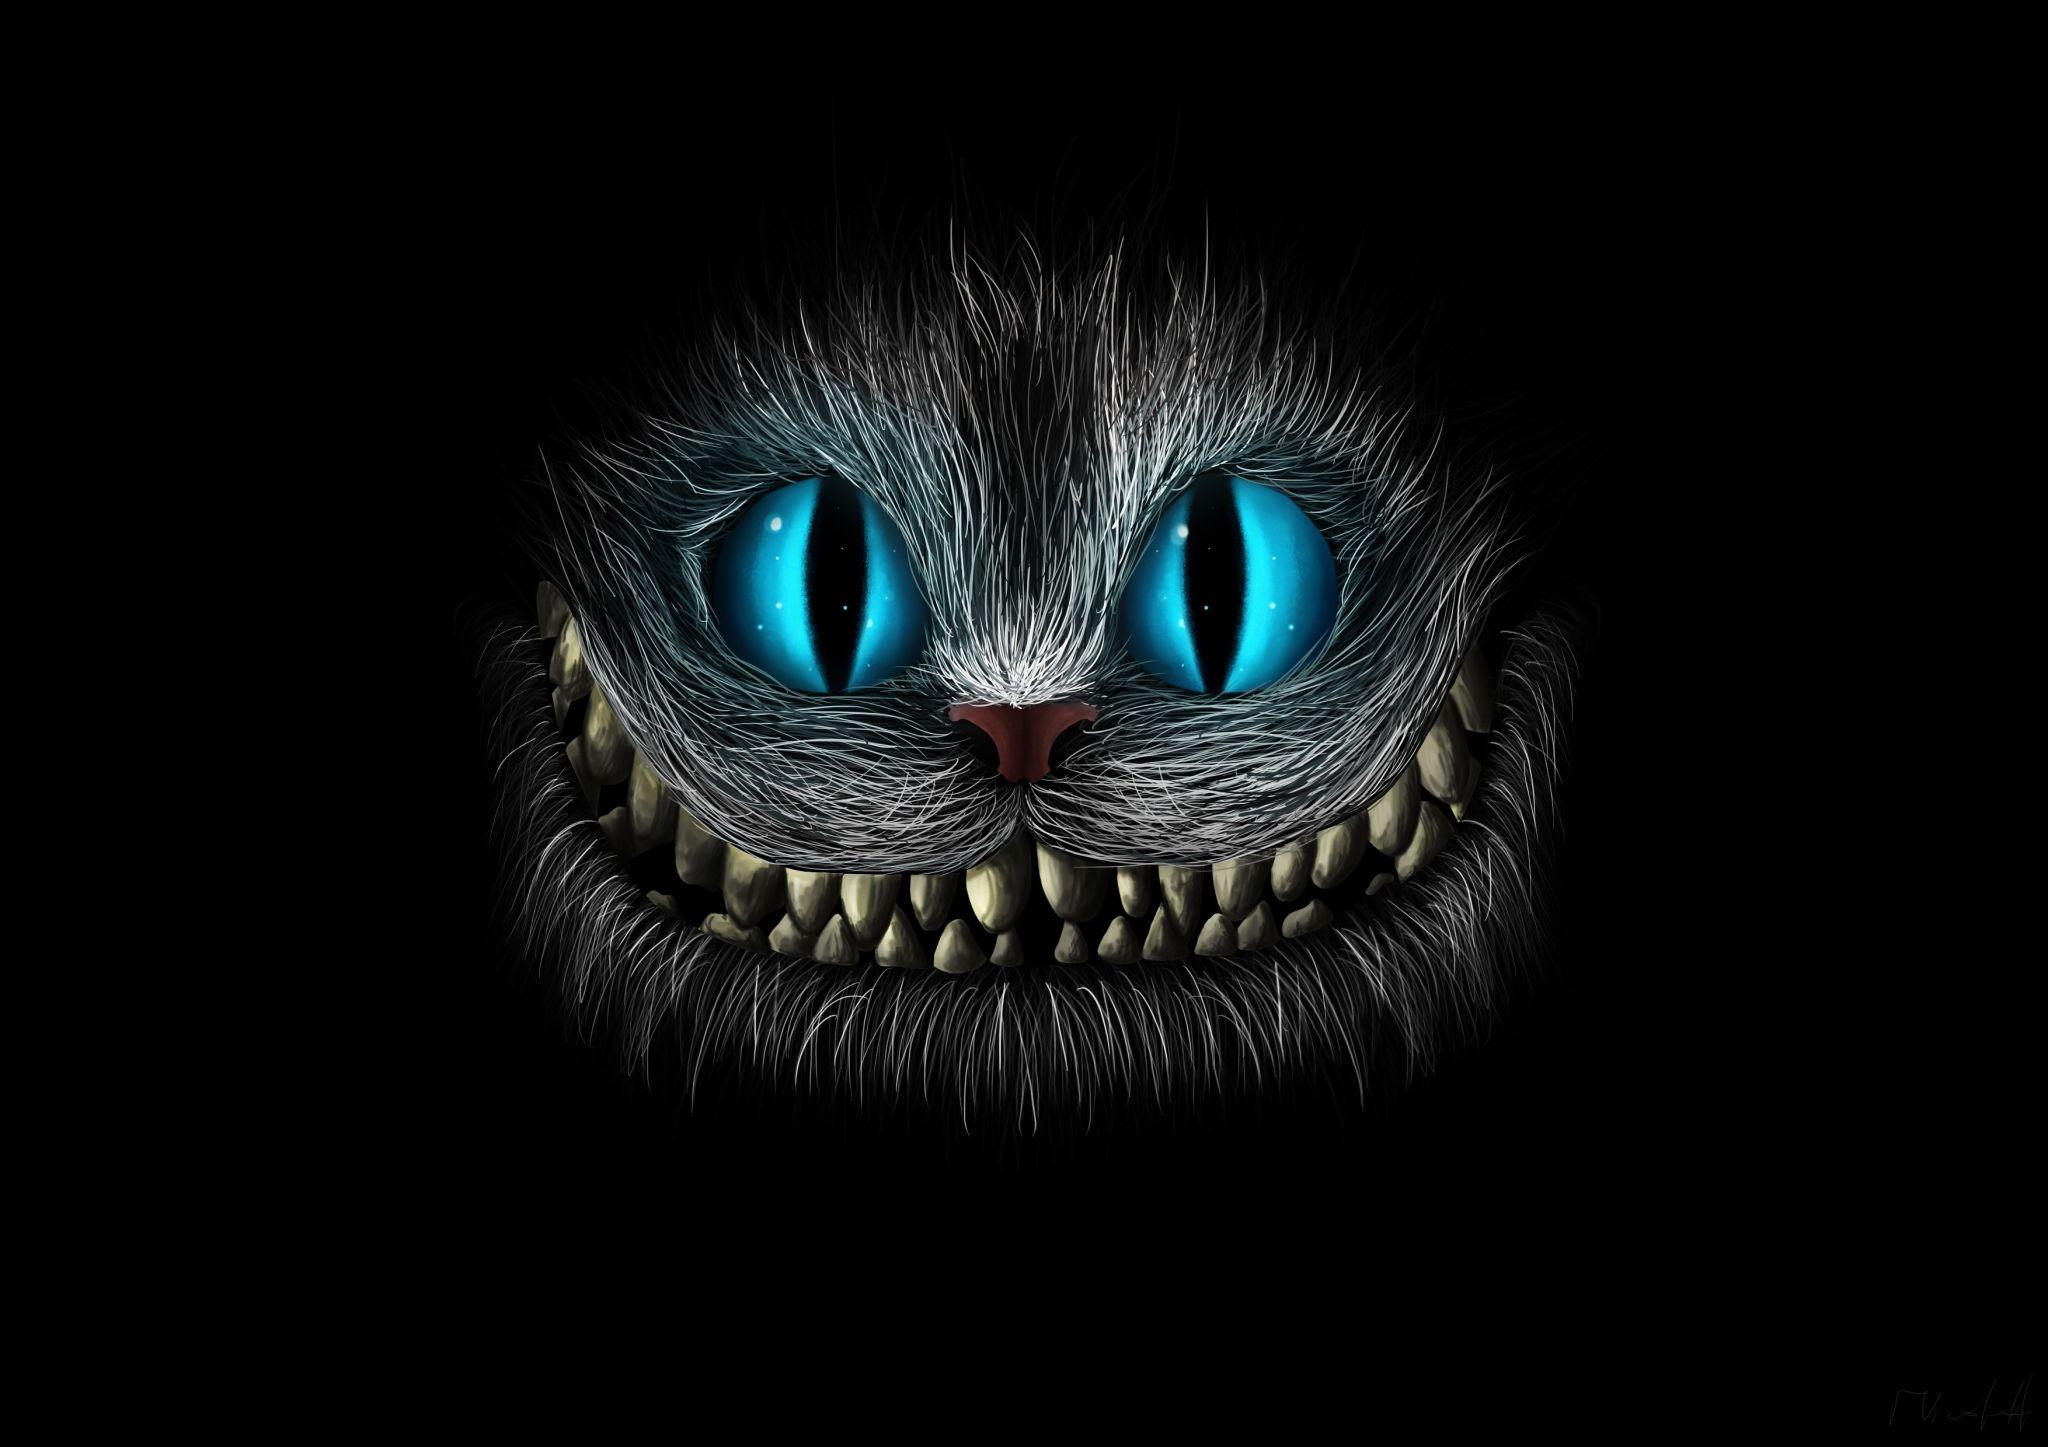 Cheshire Cat Images Background Cheshire Cat Wallpaper Cheshire Cat Cat Wallpaper